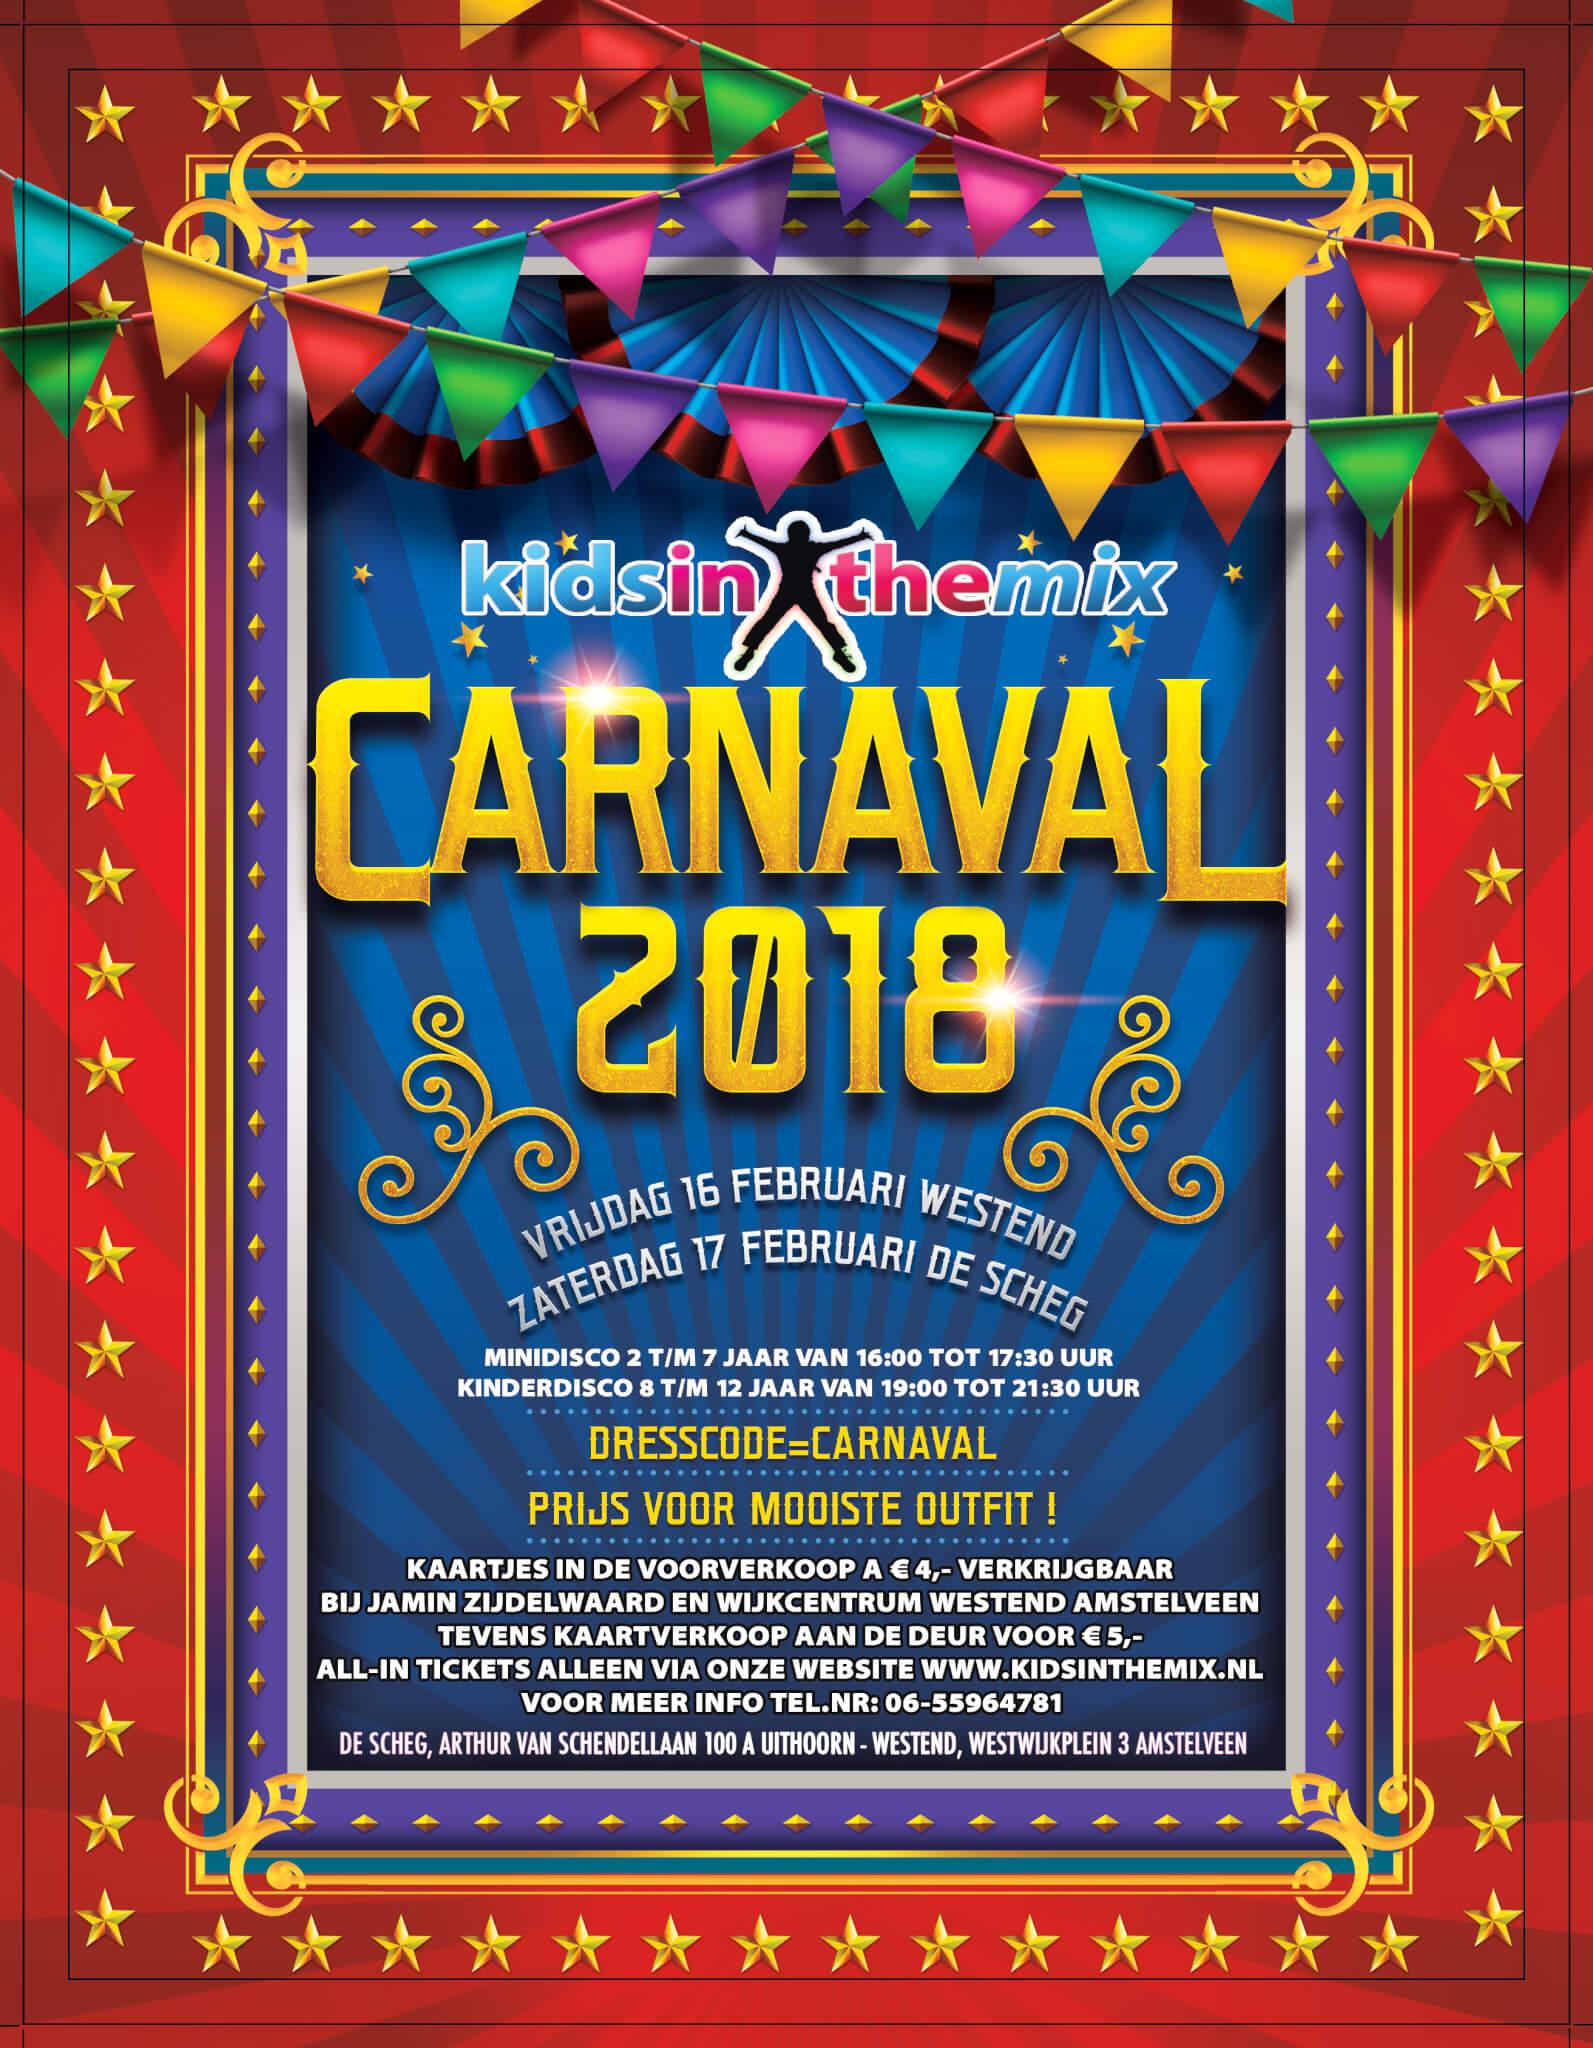 Carnaval 2018 flyer